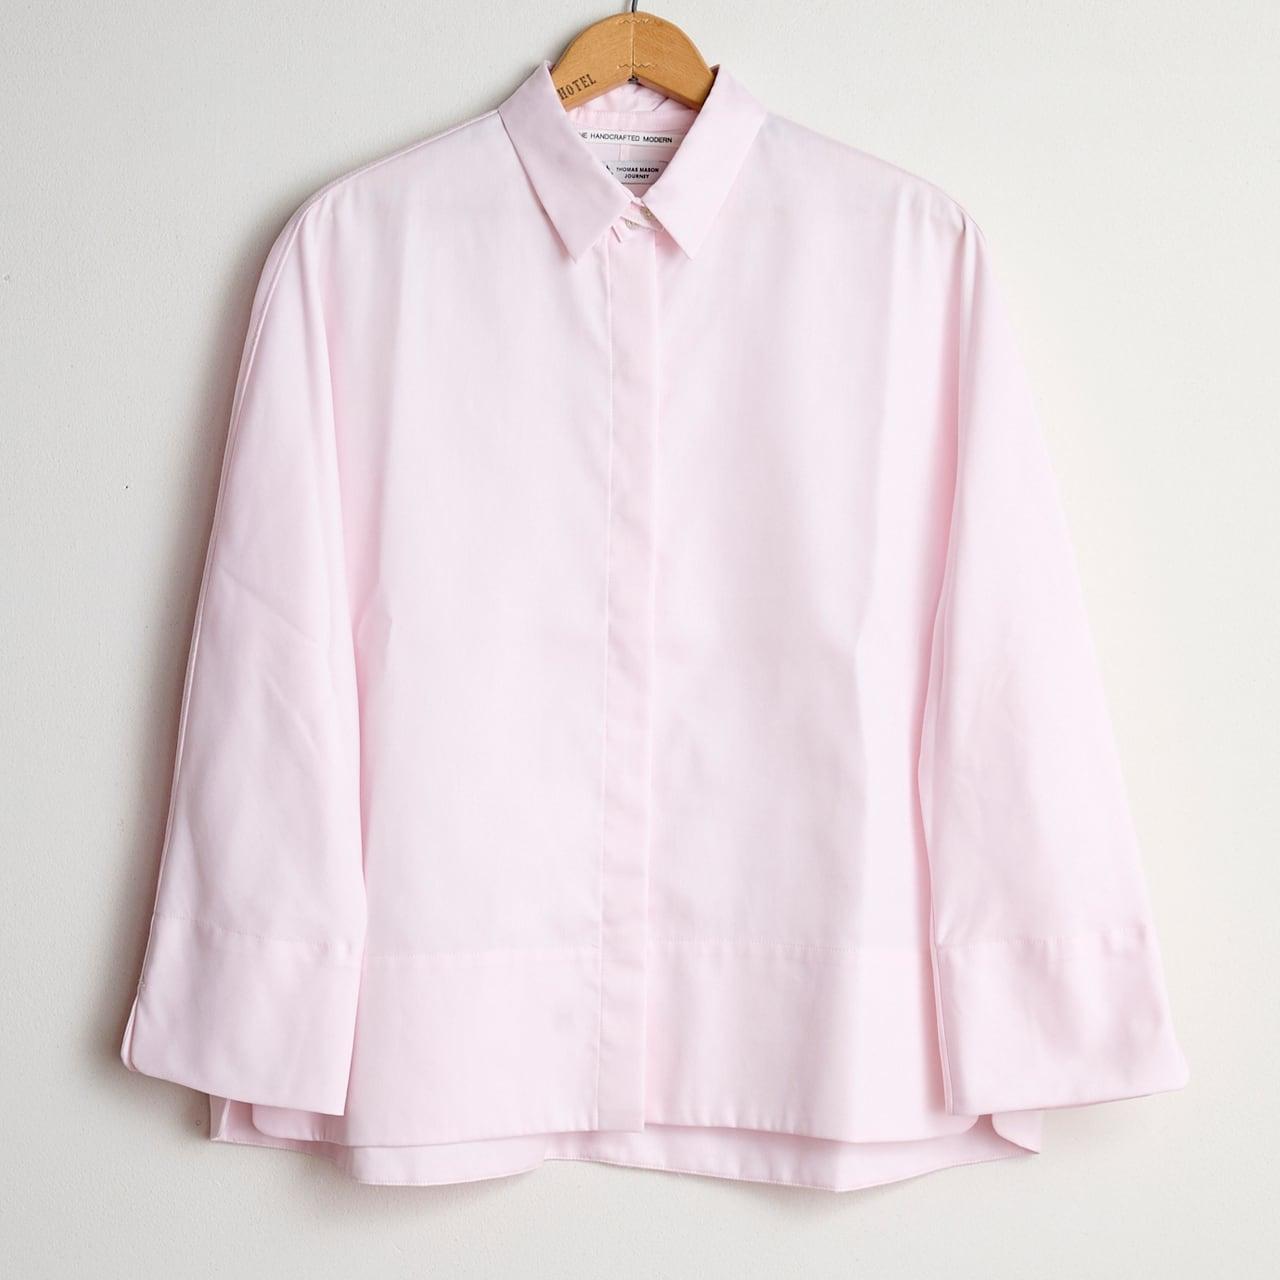 TENNE HANDCRAFTED MODERN テンハンドクラフテッドモダン  GUZZET SLEEVE SHIRTS pink